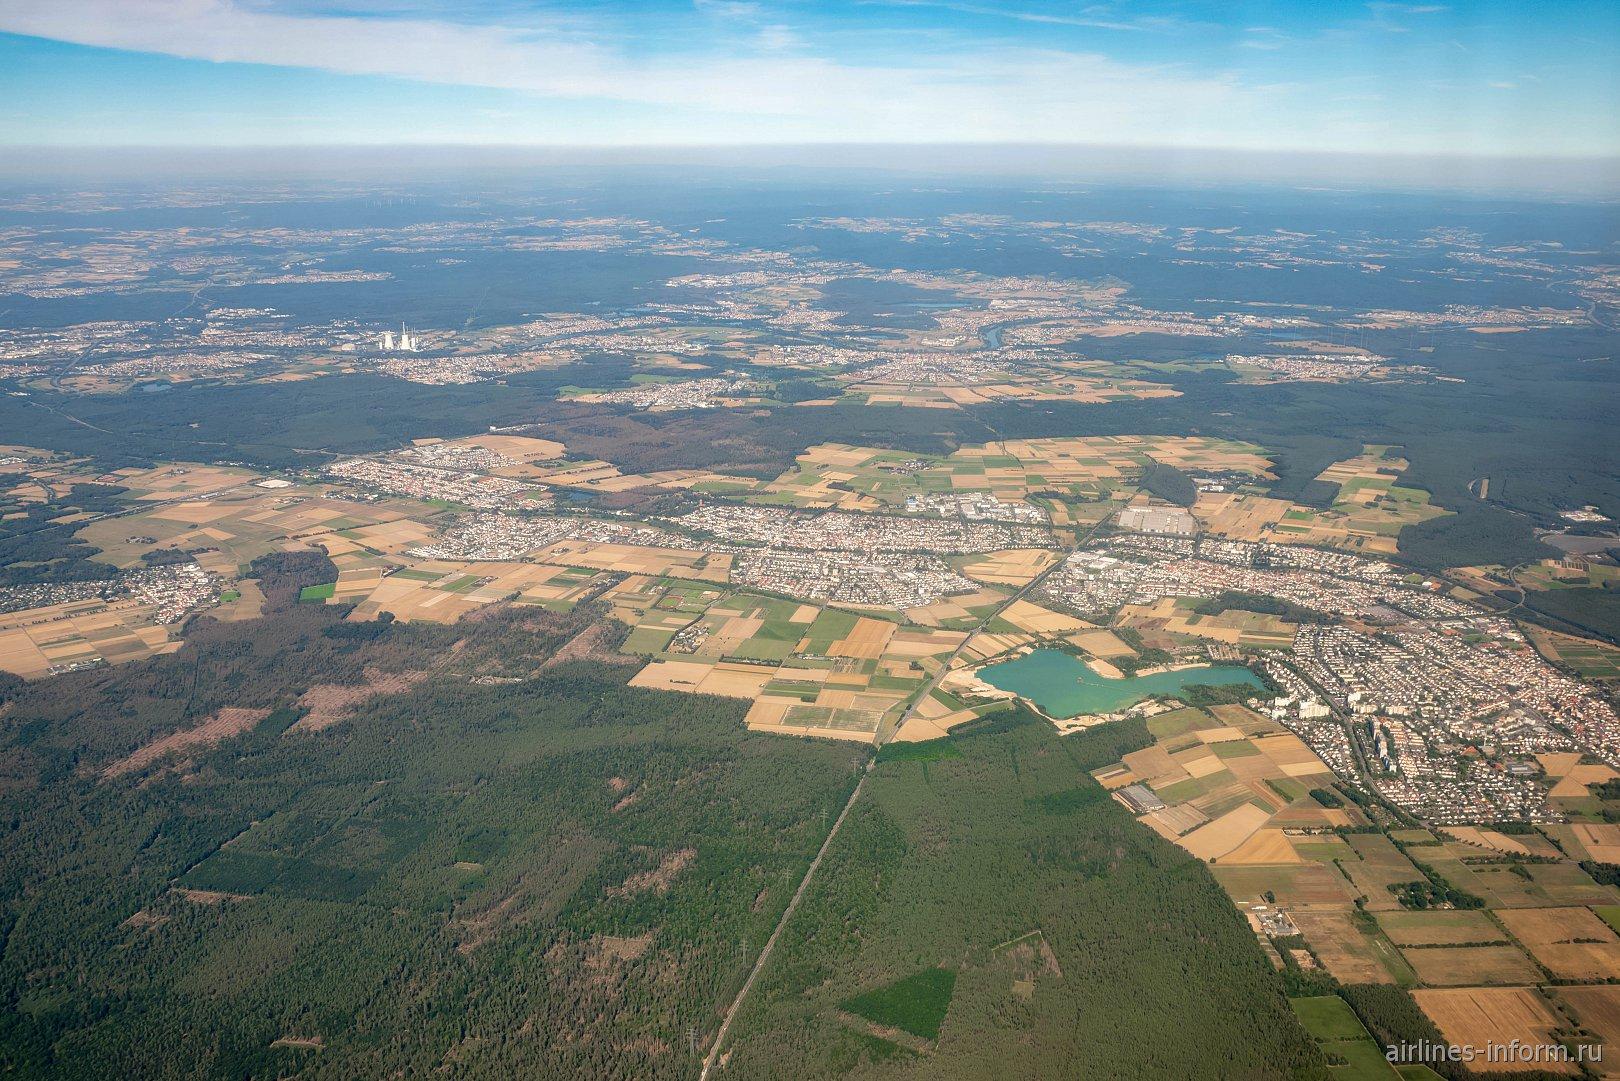 Пригороды города Франкфурт-на-Майне